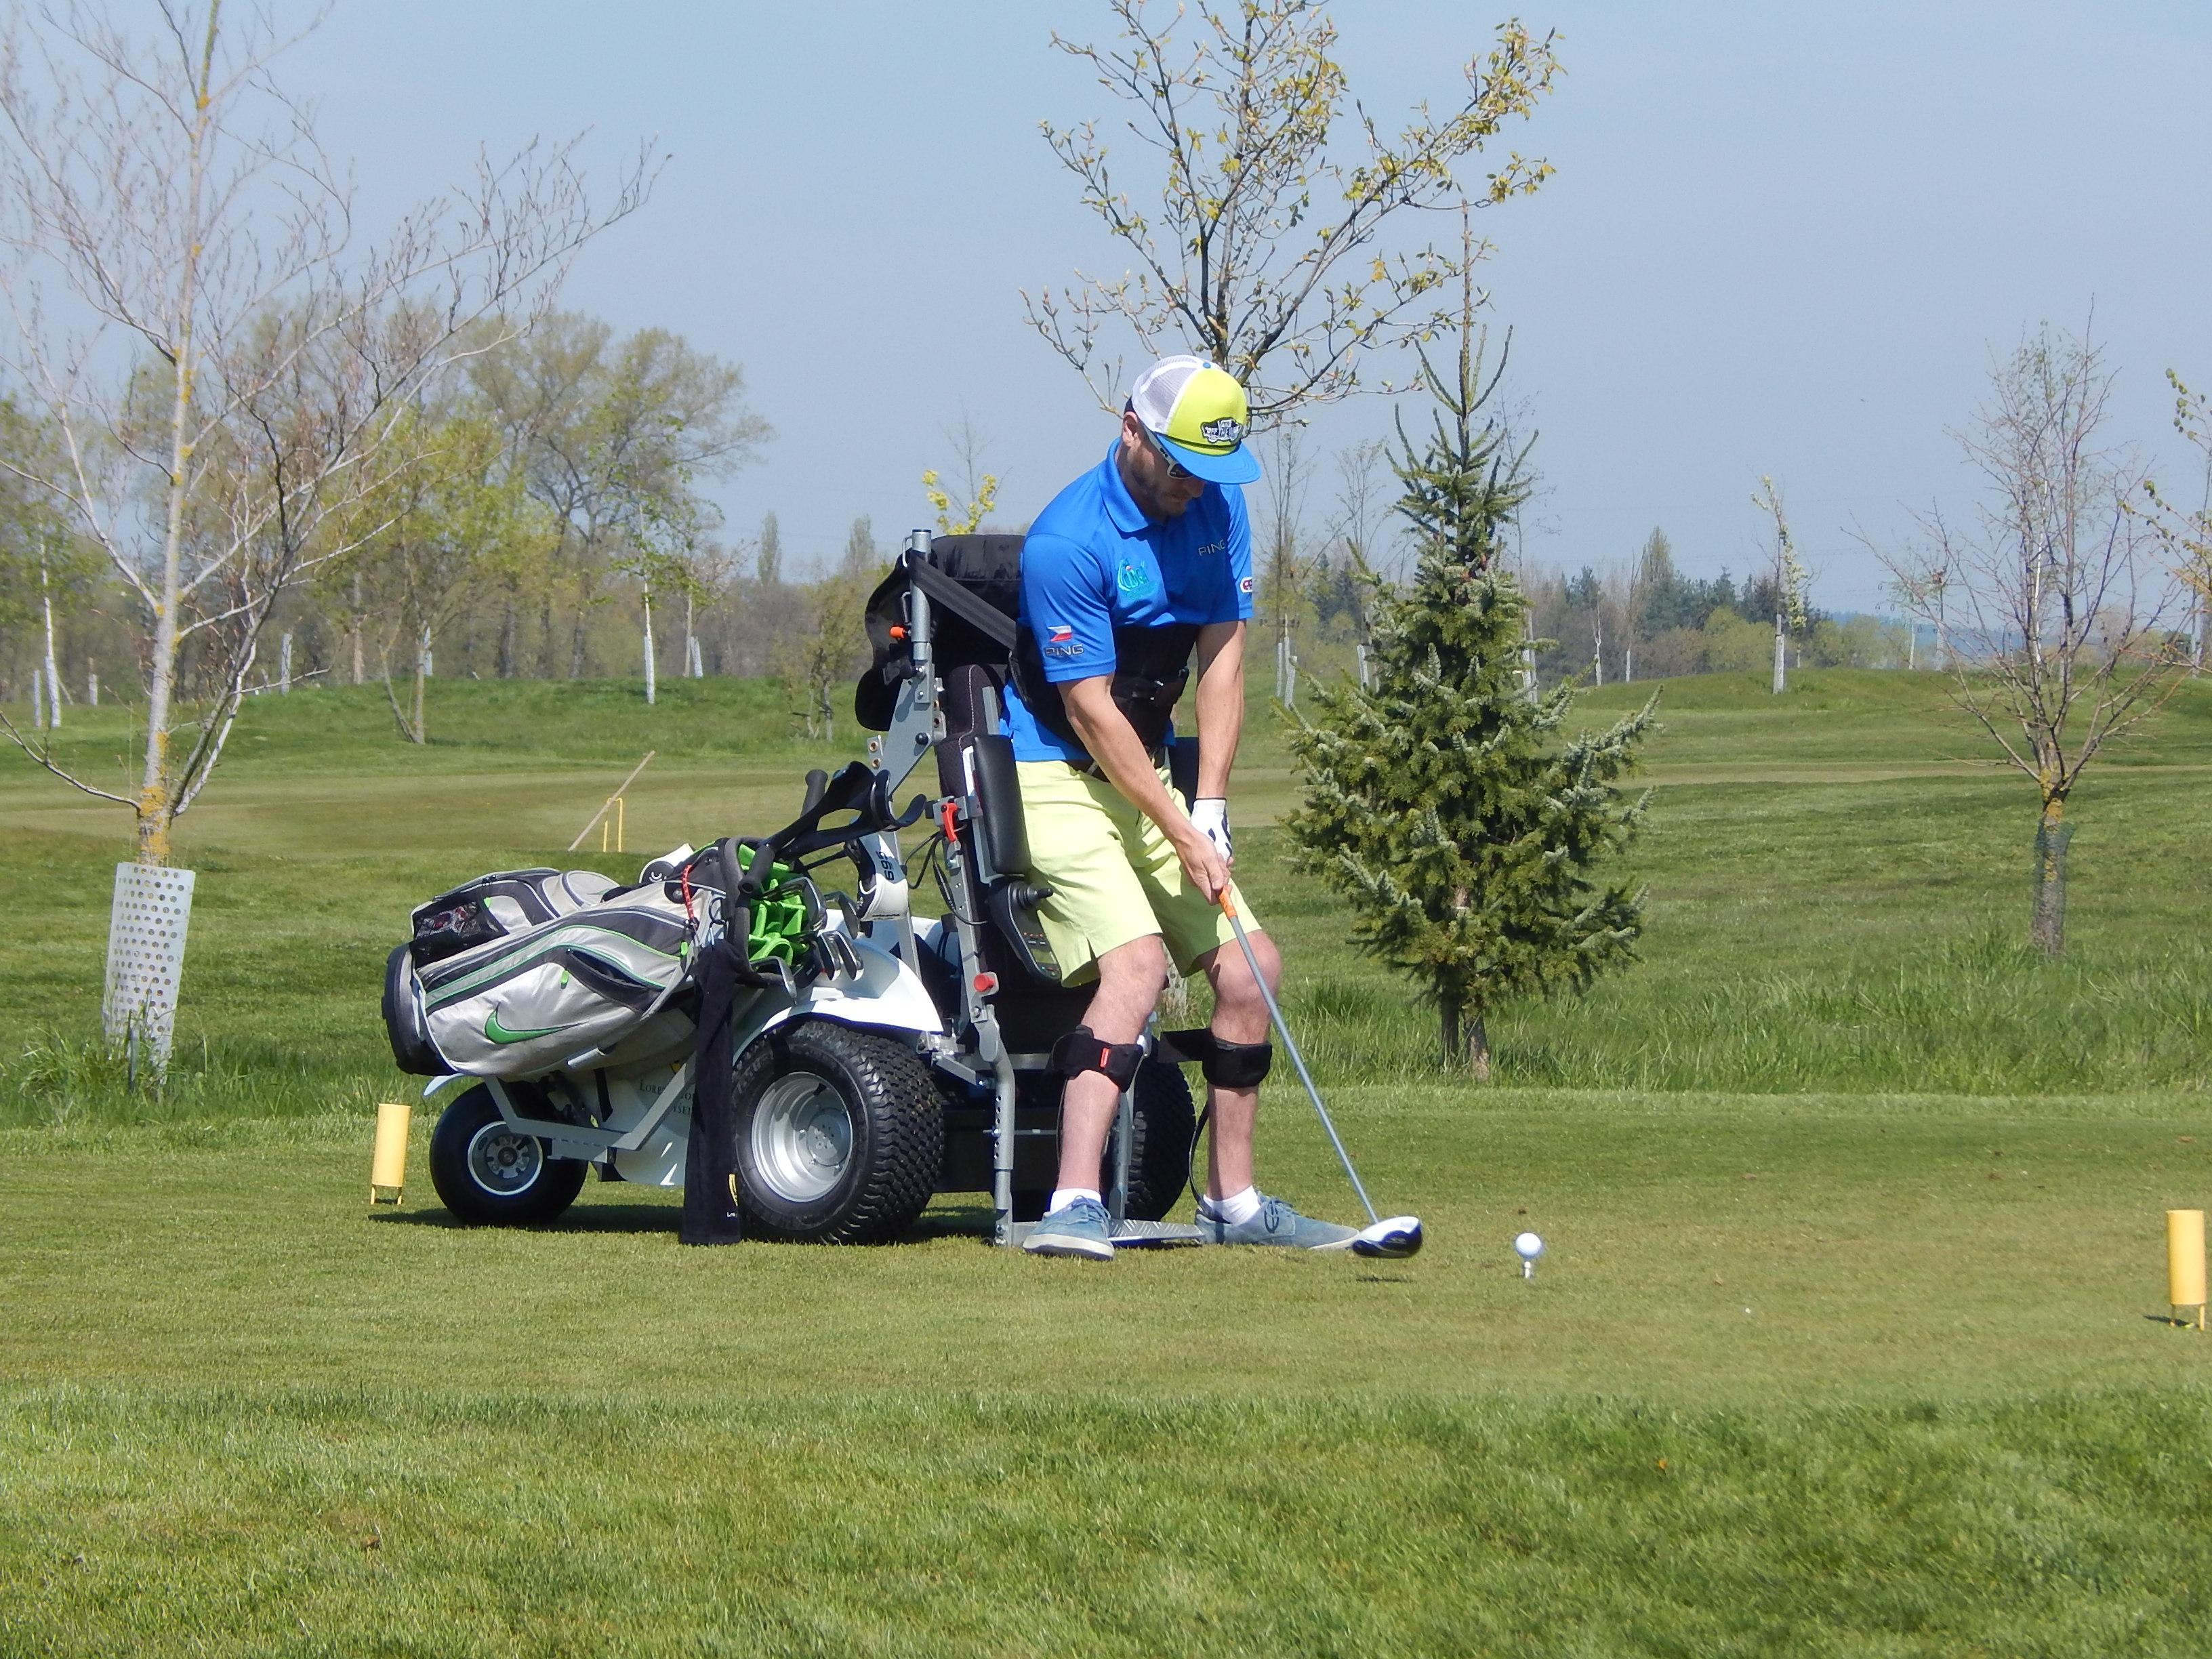 Park Golf a Konference Park Hradec Krlov 8 Nejlep datovn lokalit : sport seznamka praha Hradec Krlov Online seznamka aplikace Hradec Krlov